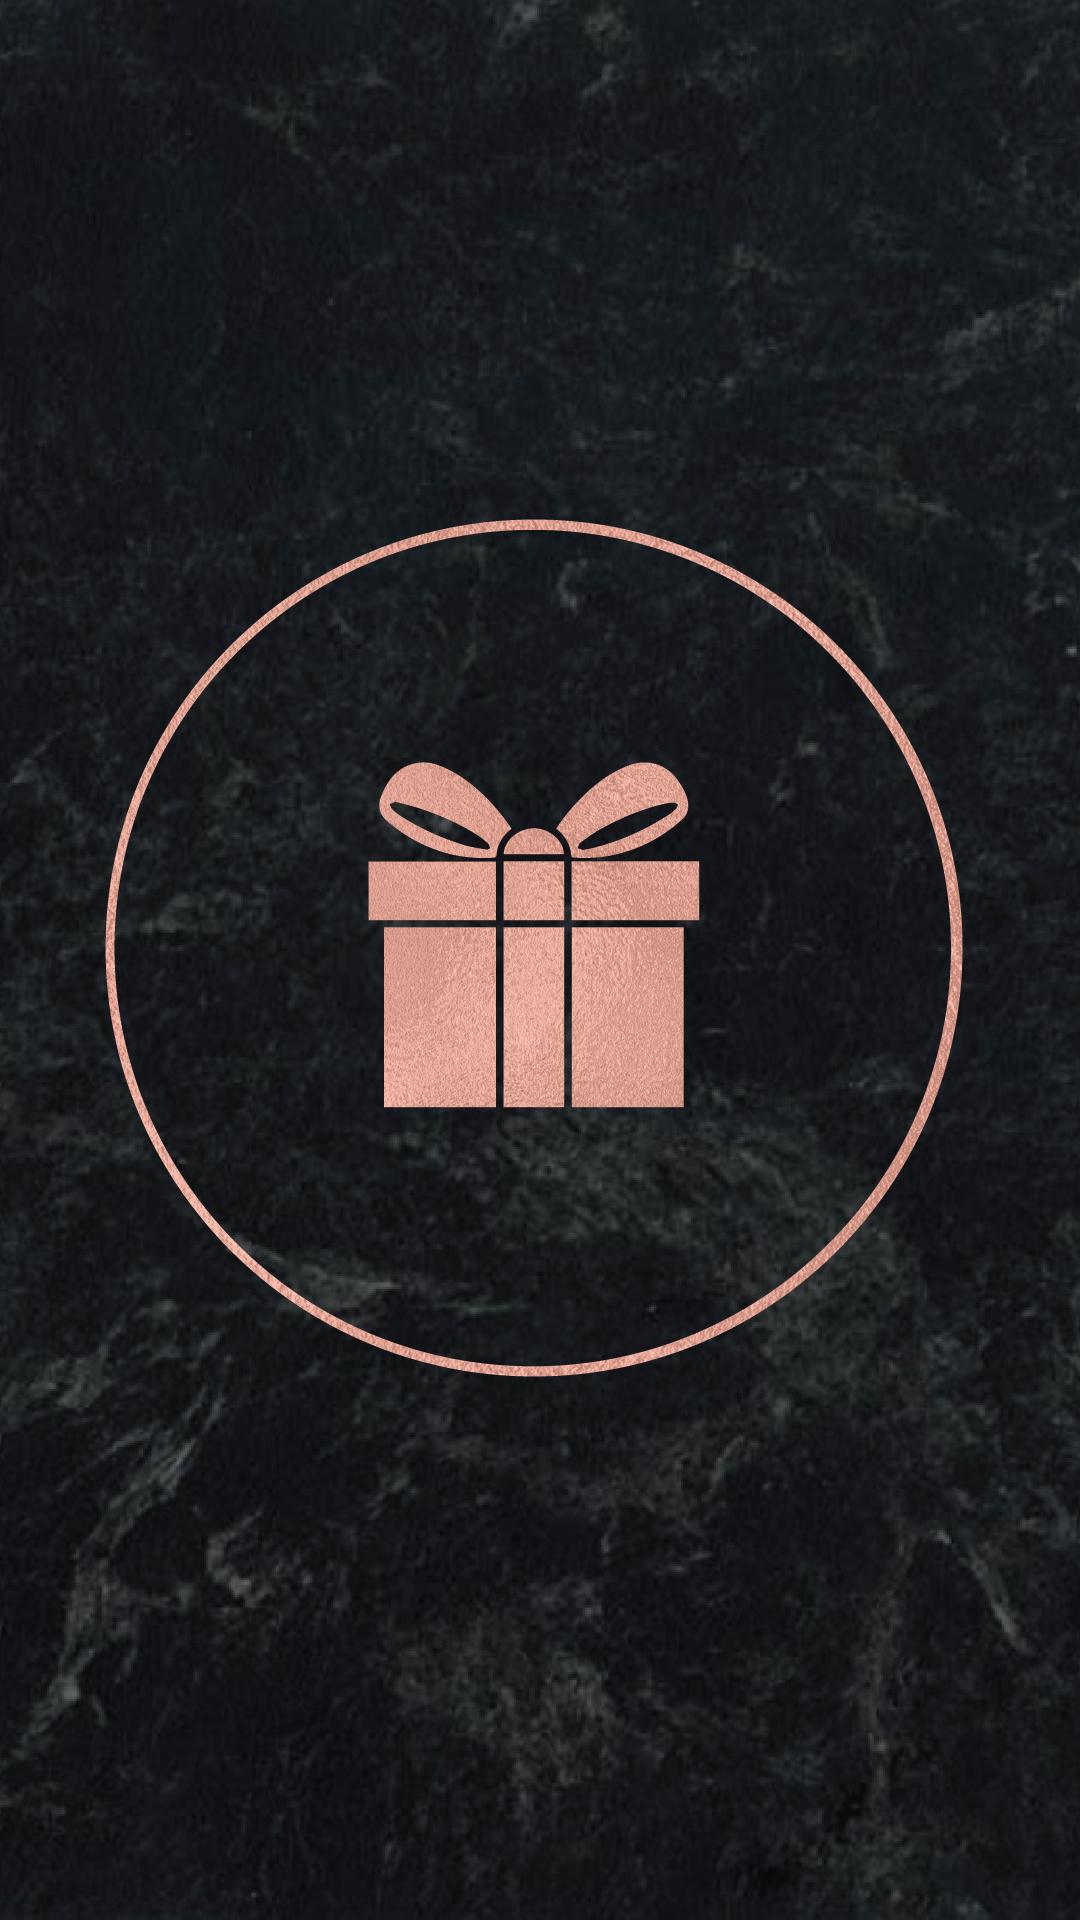 20 Rose Gold Instagram Highlight Covers Highlight Icons | Etsy in 2020 | Instagram highlight ...